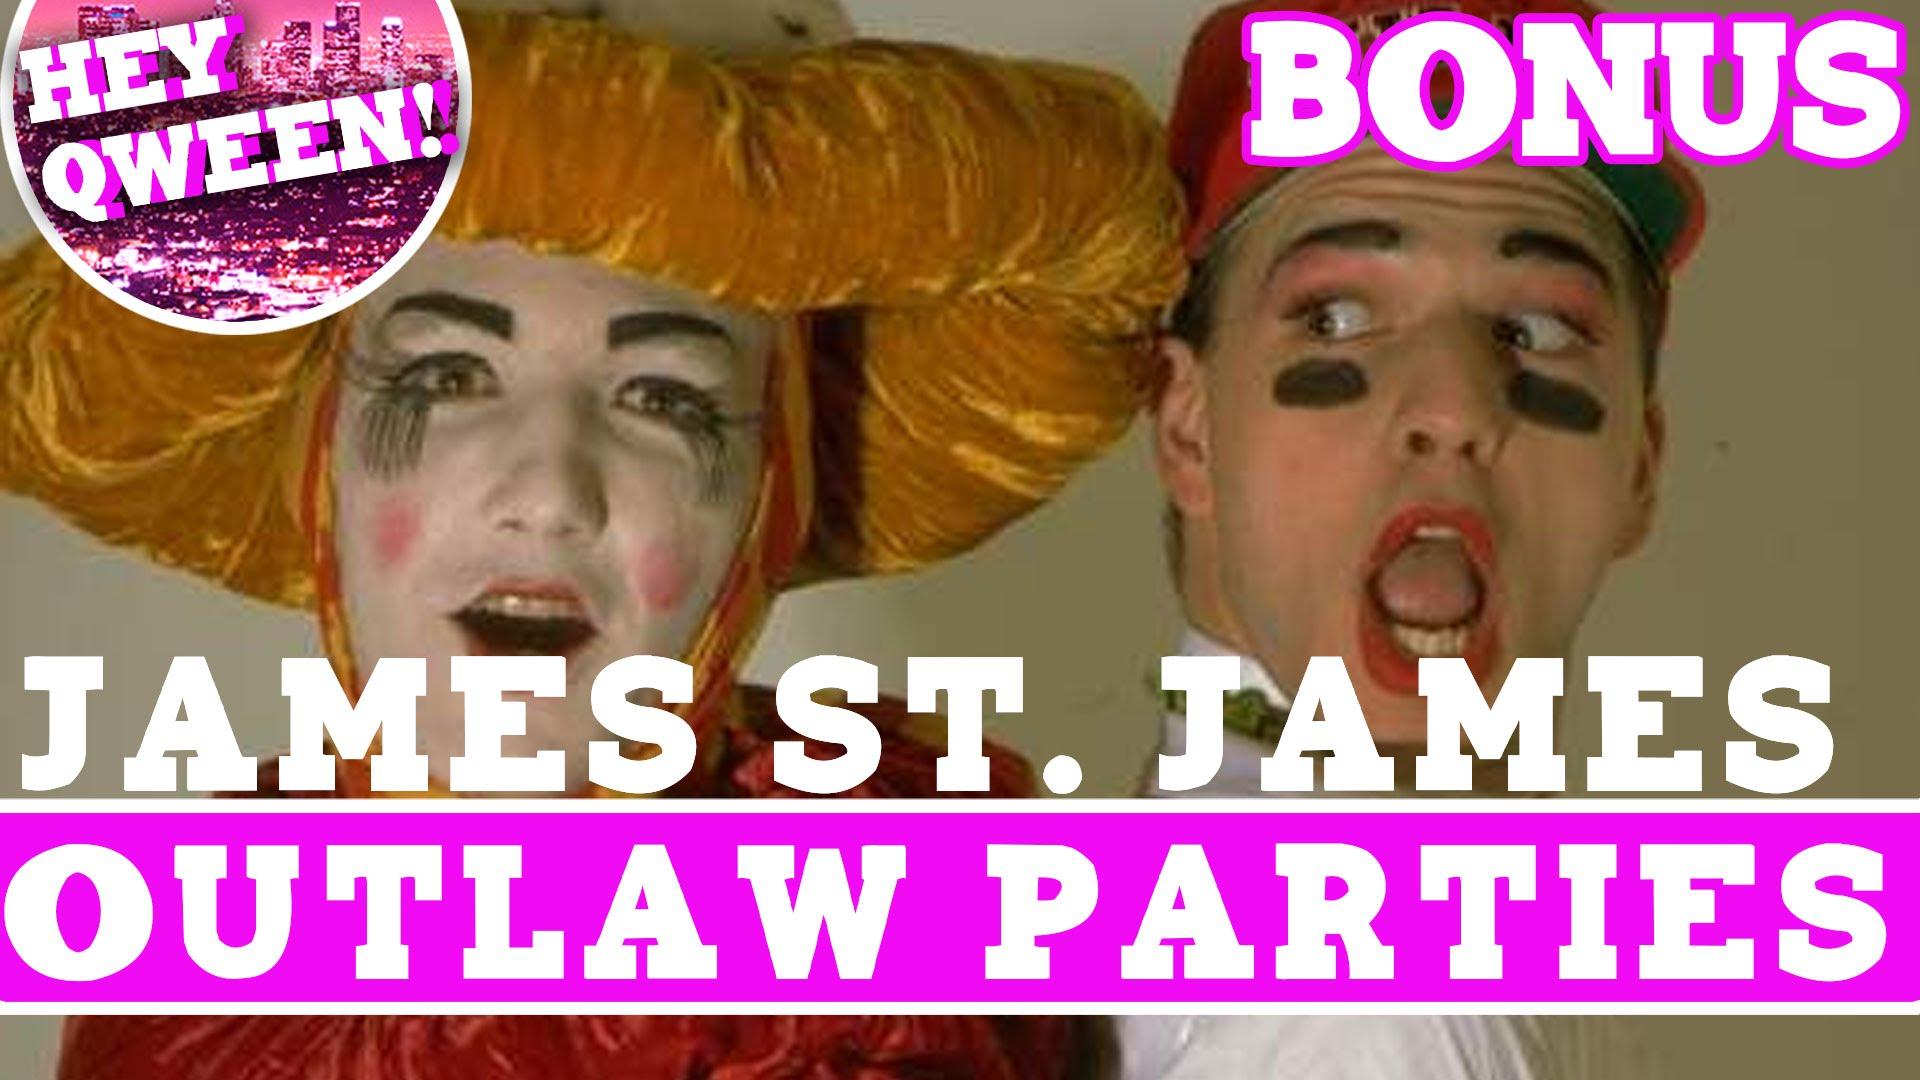 Hey Qween! BONUS: James St James Describes 1980s Outlaw Parties